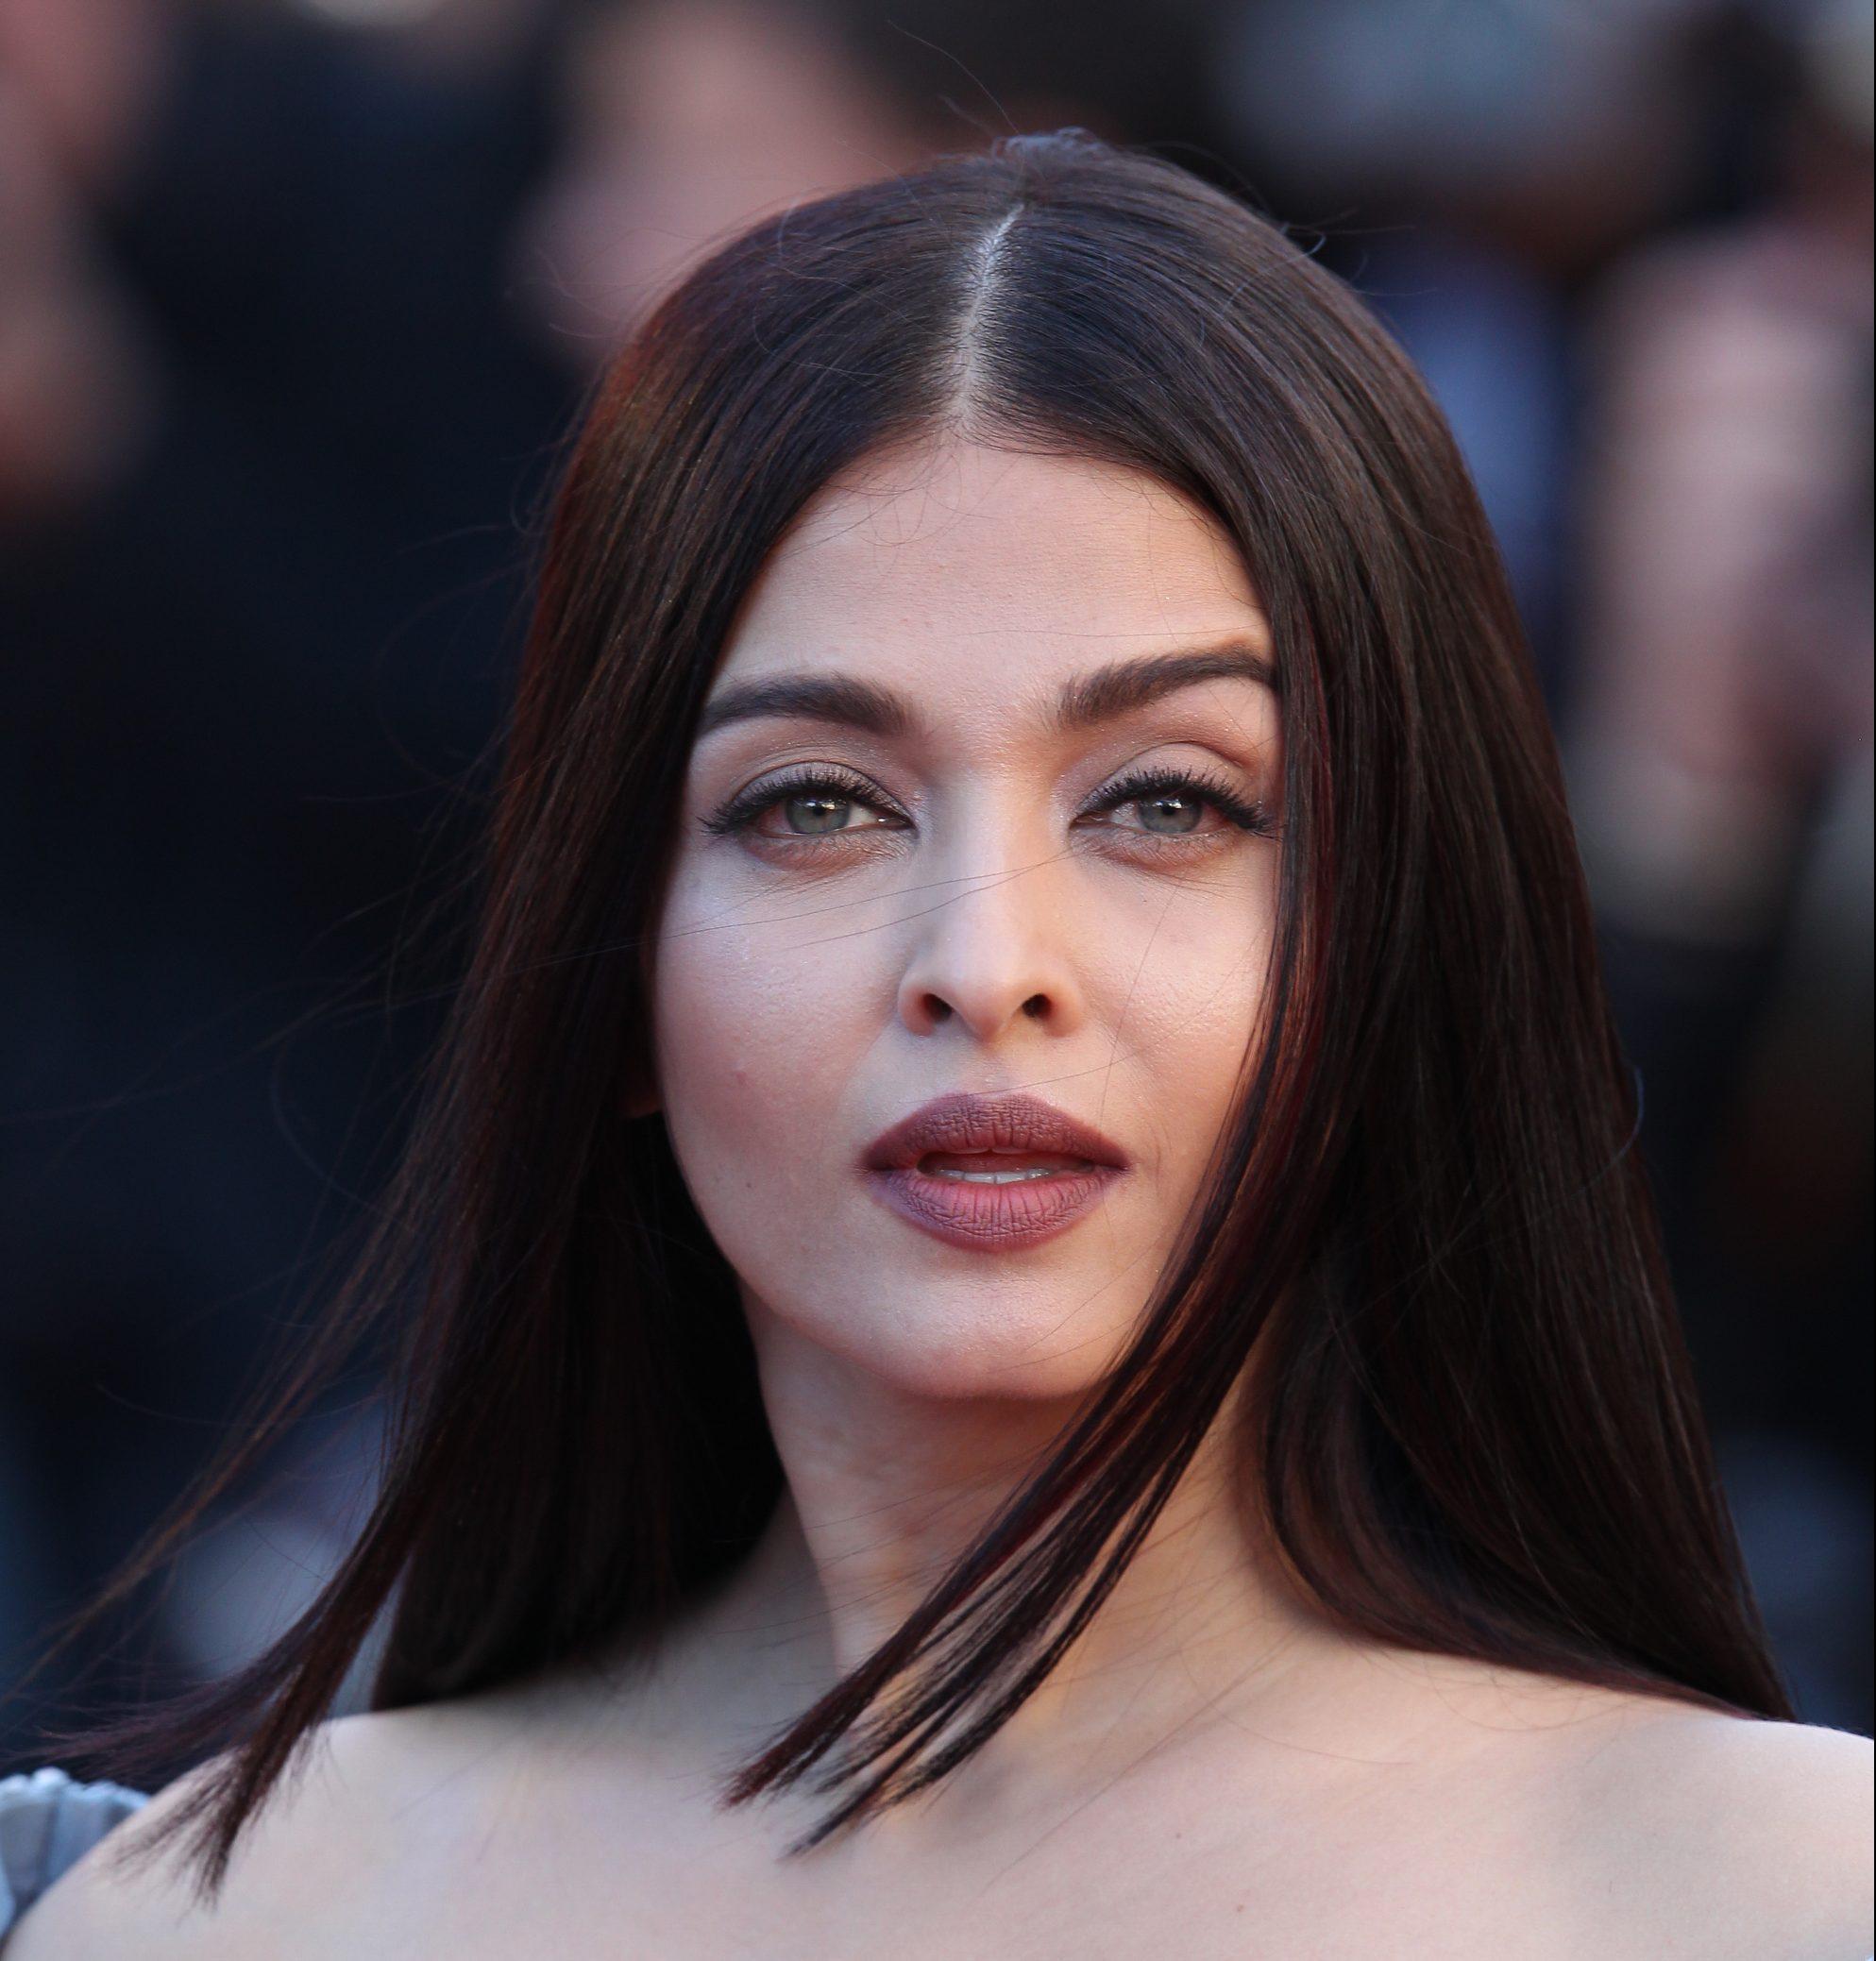 Bollywood Superstar Aishwarya Rai Bachchan In Hospital With COVID-19 –  Deadline